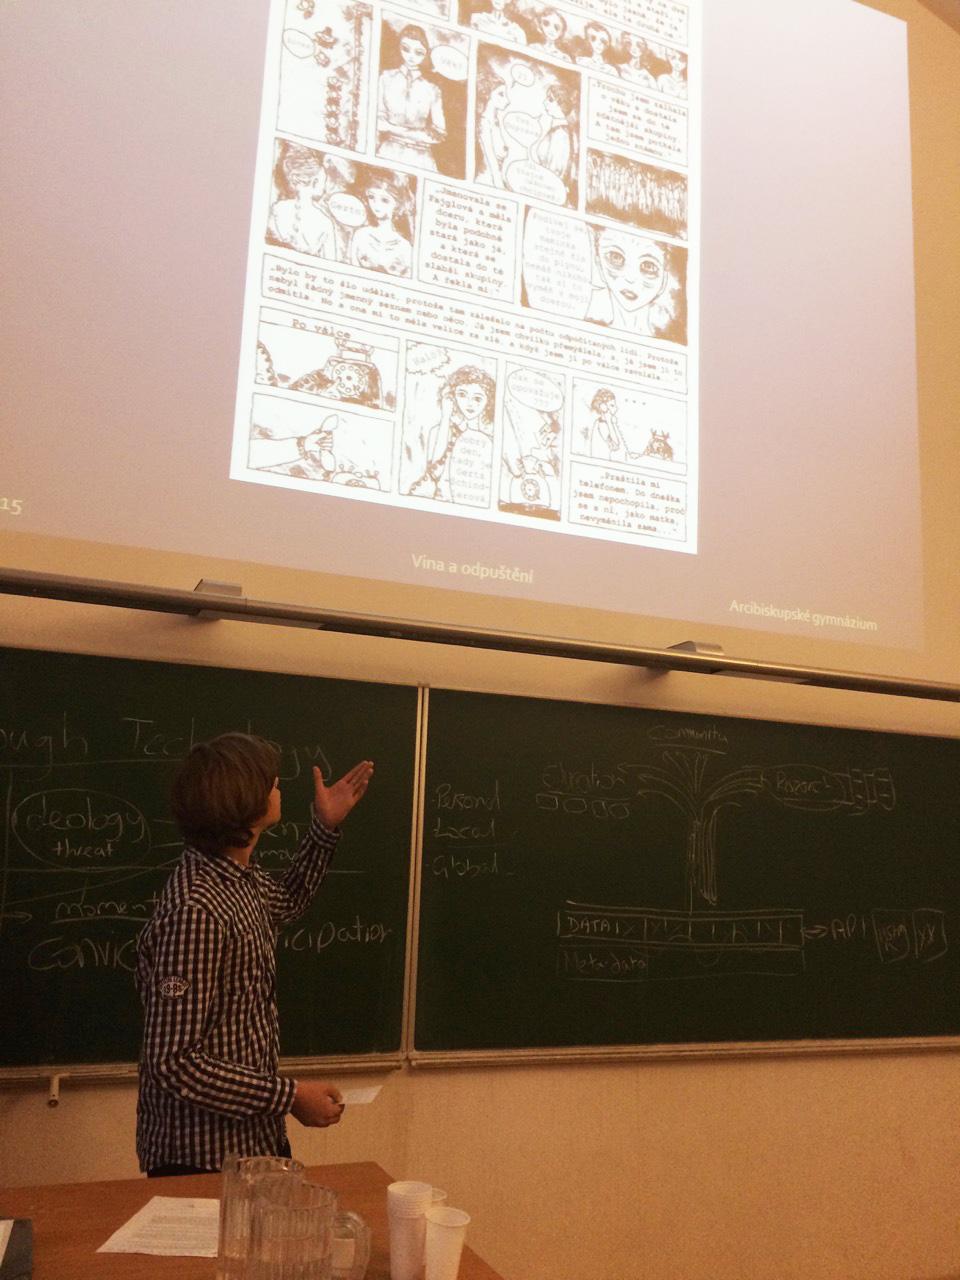 One of the student cartoons based on VHA testimony